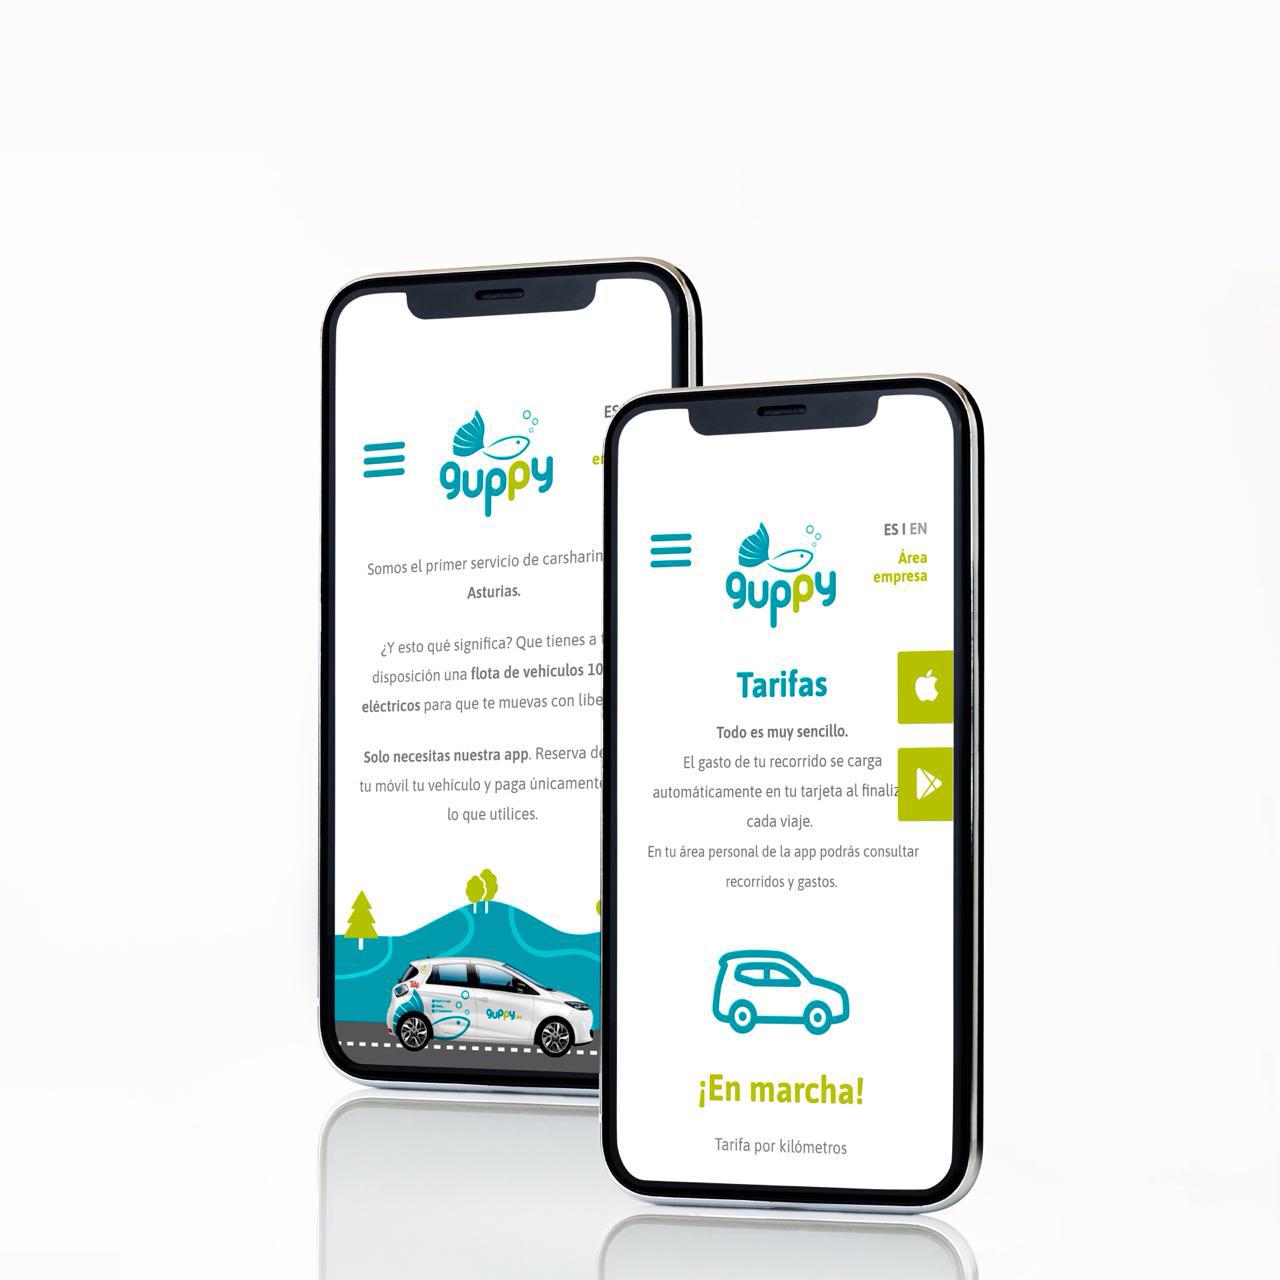 Guppy Carsharing logo